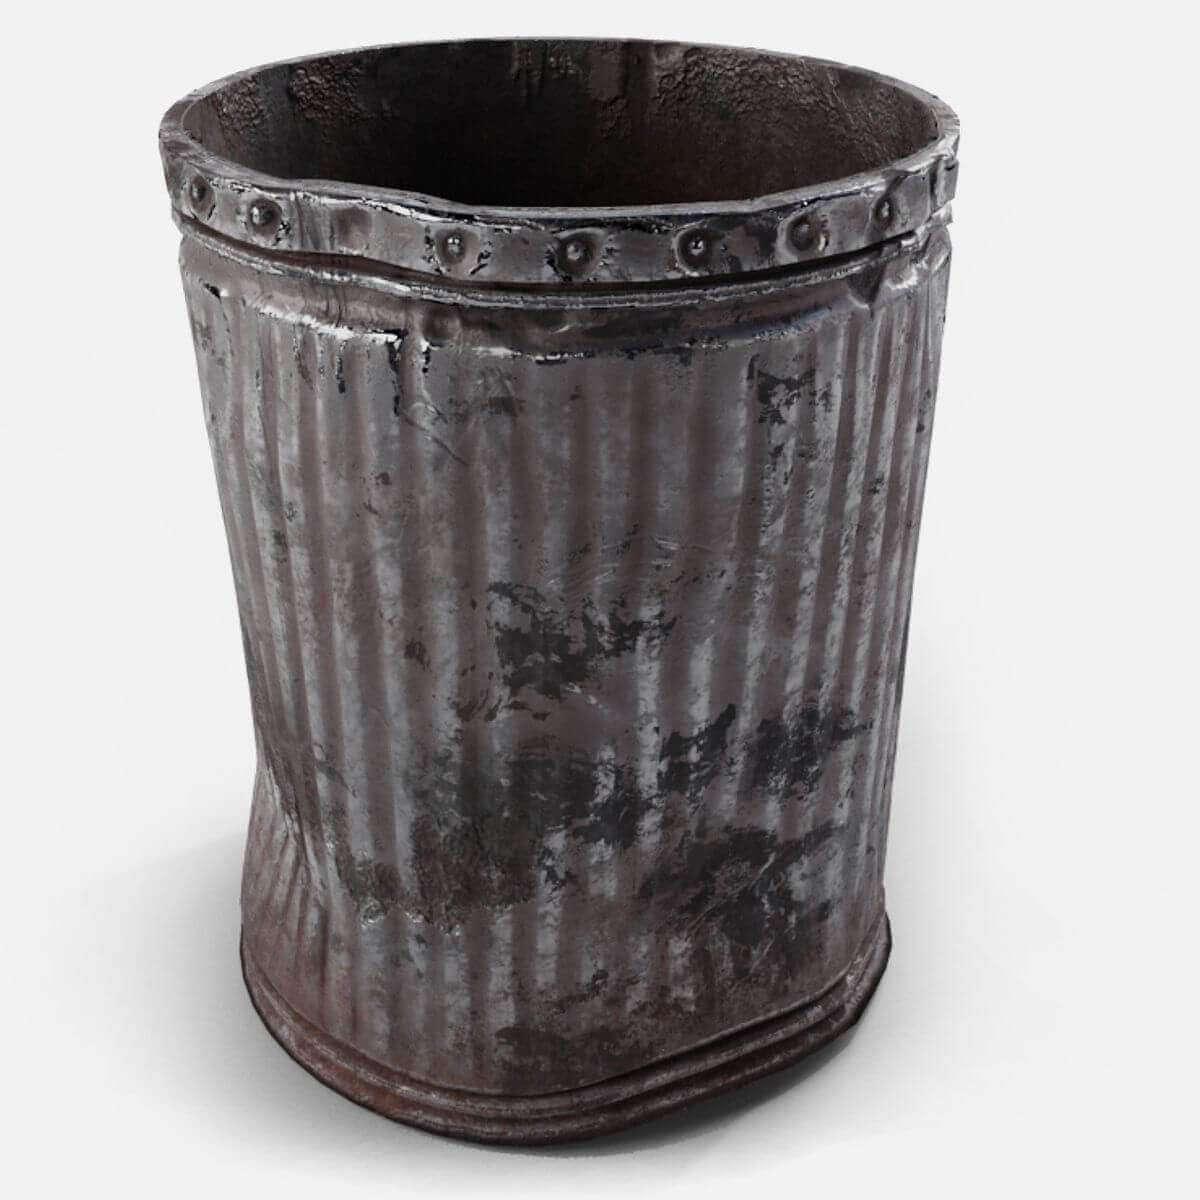 Aluminum Trash Cans : Used metal trash can d model